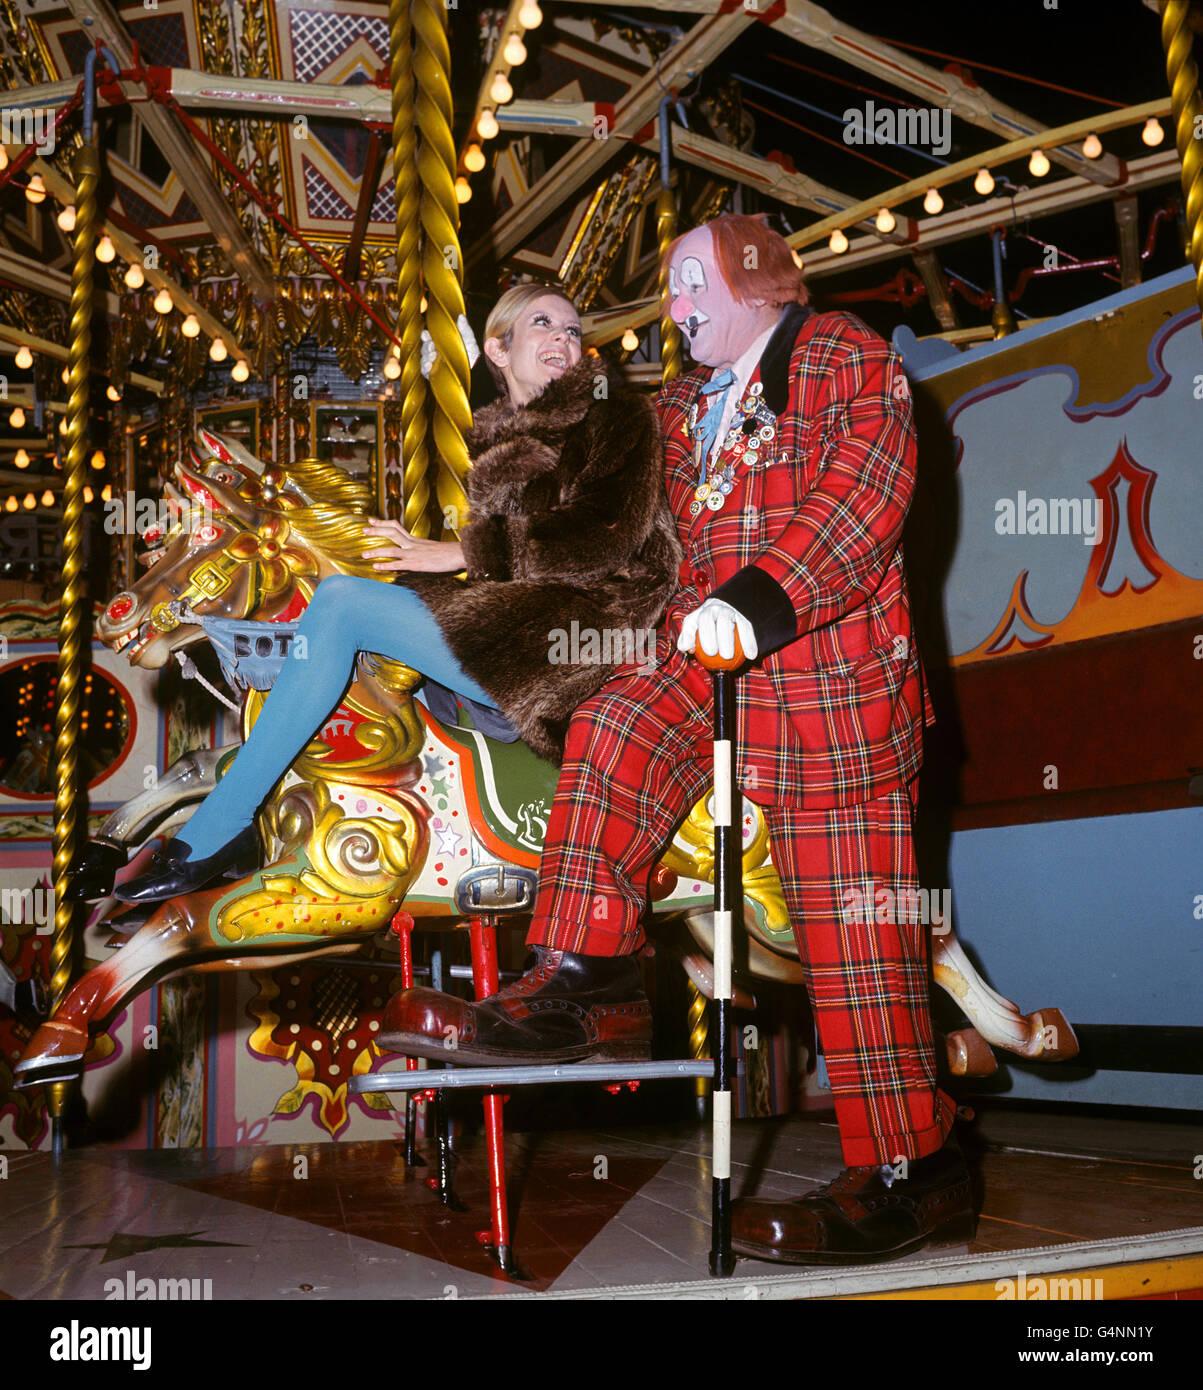 Fashion - Twiggy - Bertram Mills Circus Stock Photo